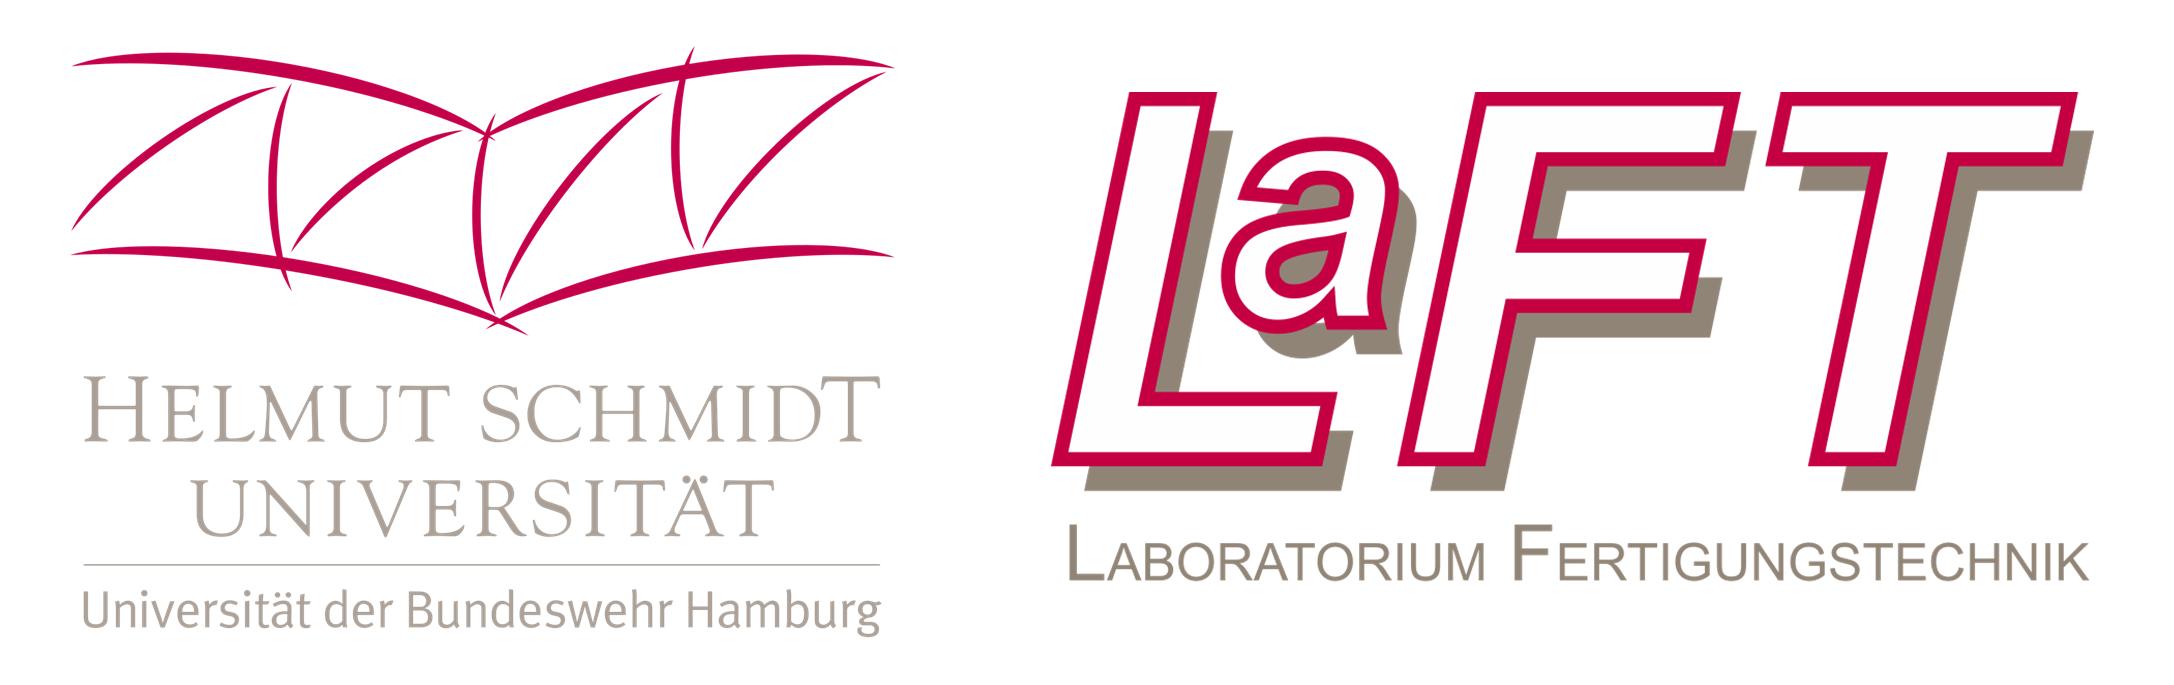 Logo_LaFT_HSU Hamburg.png